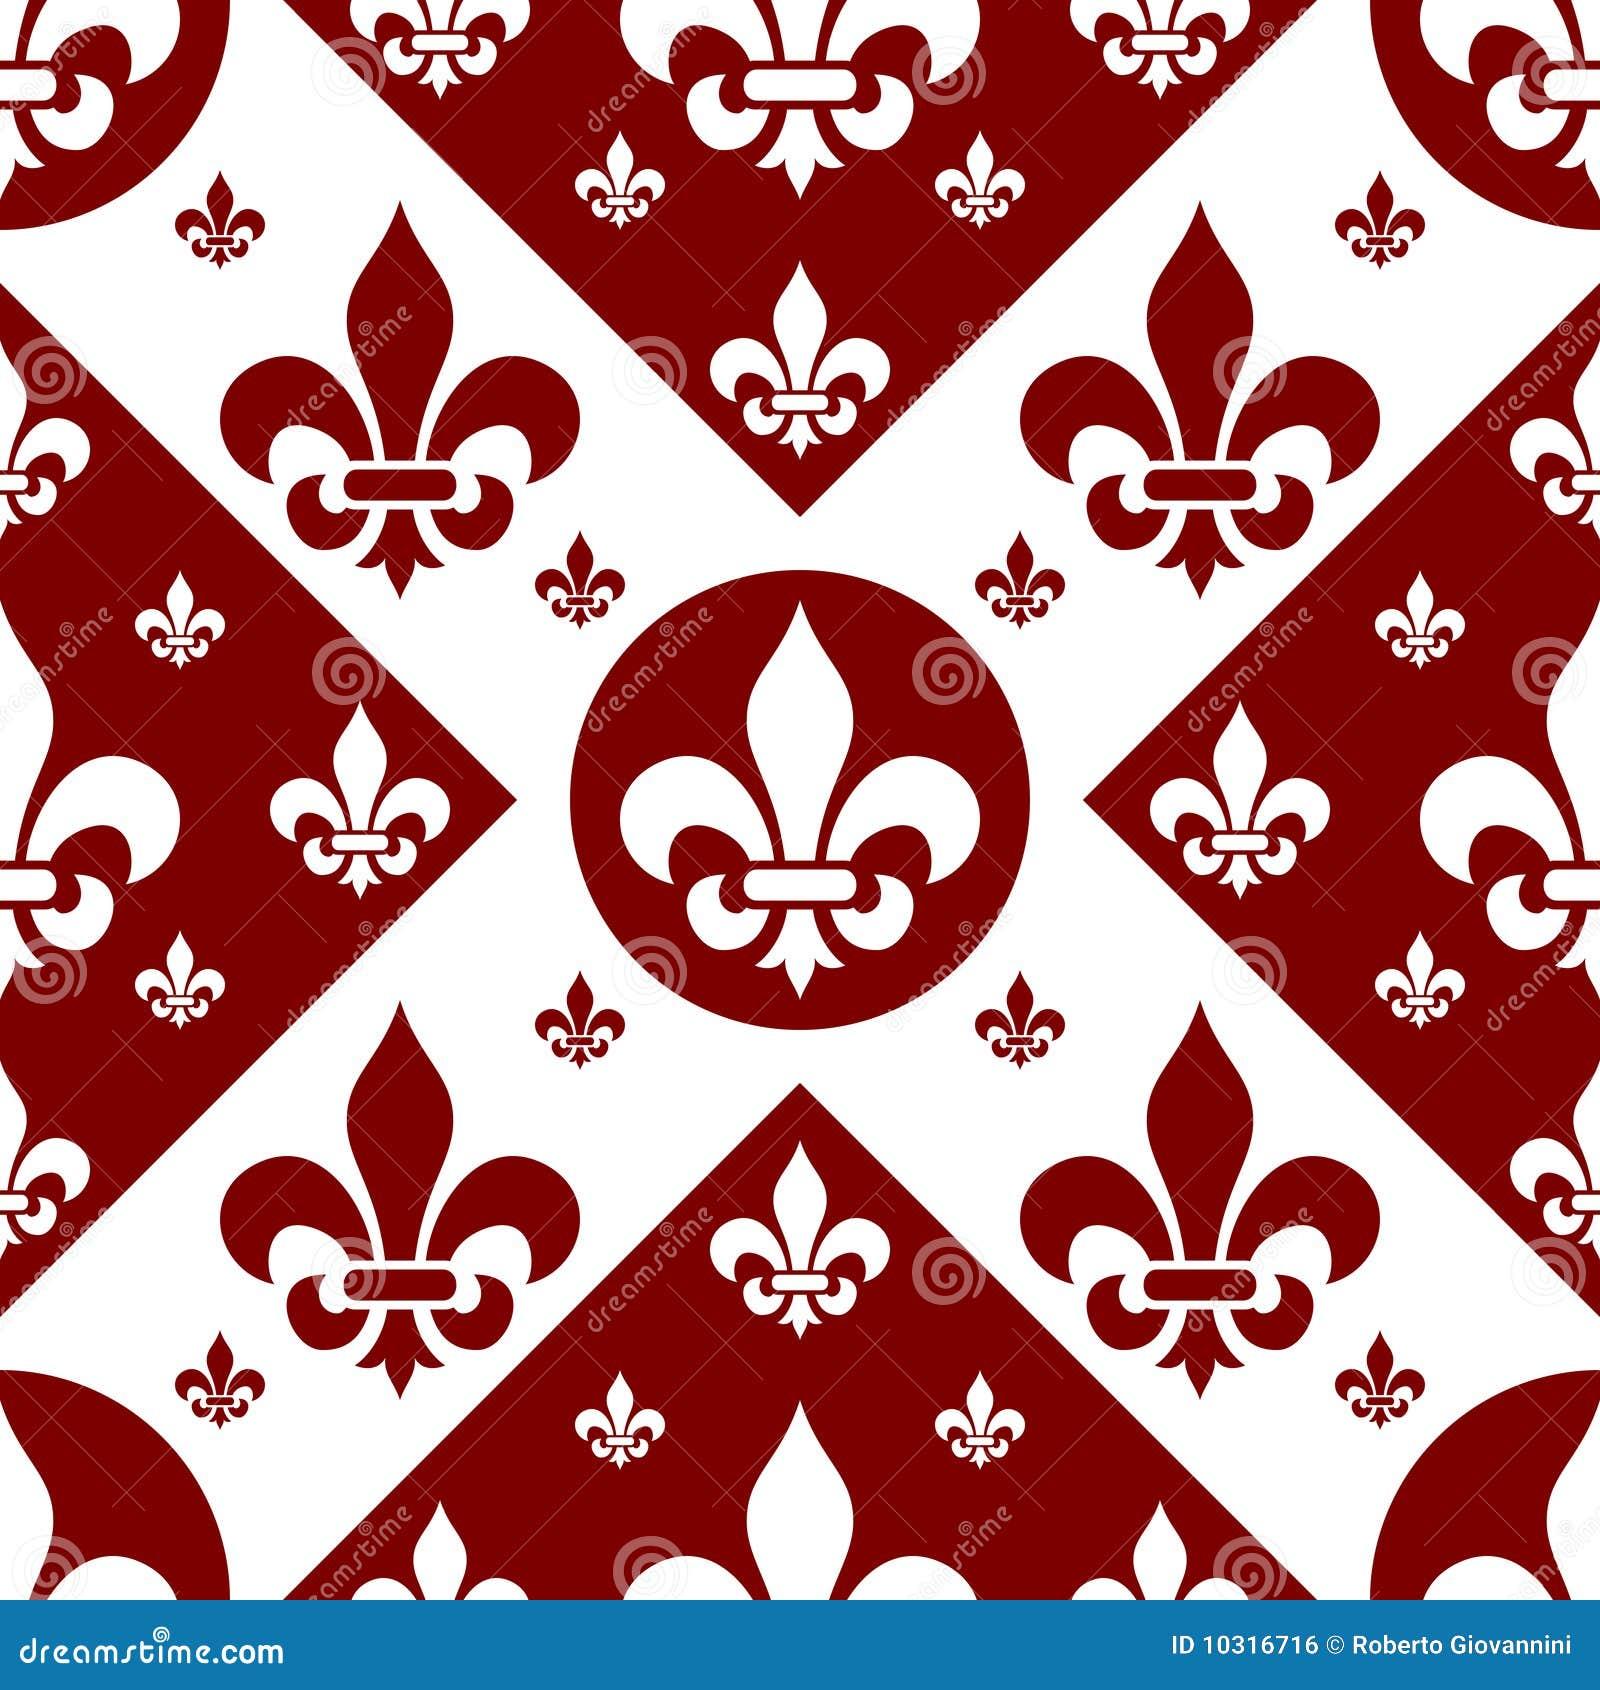 Seamless Fleur De Lys Tile 2 Royalty Free Stock Image